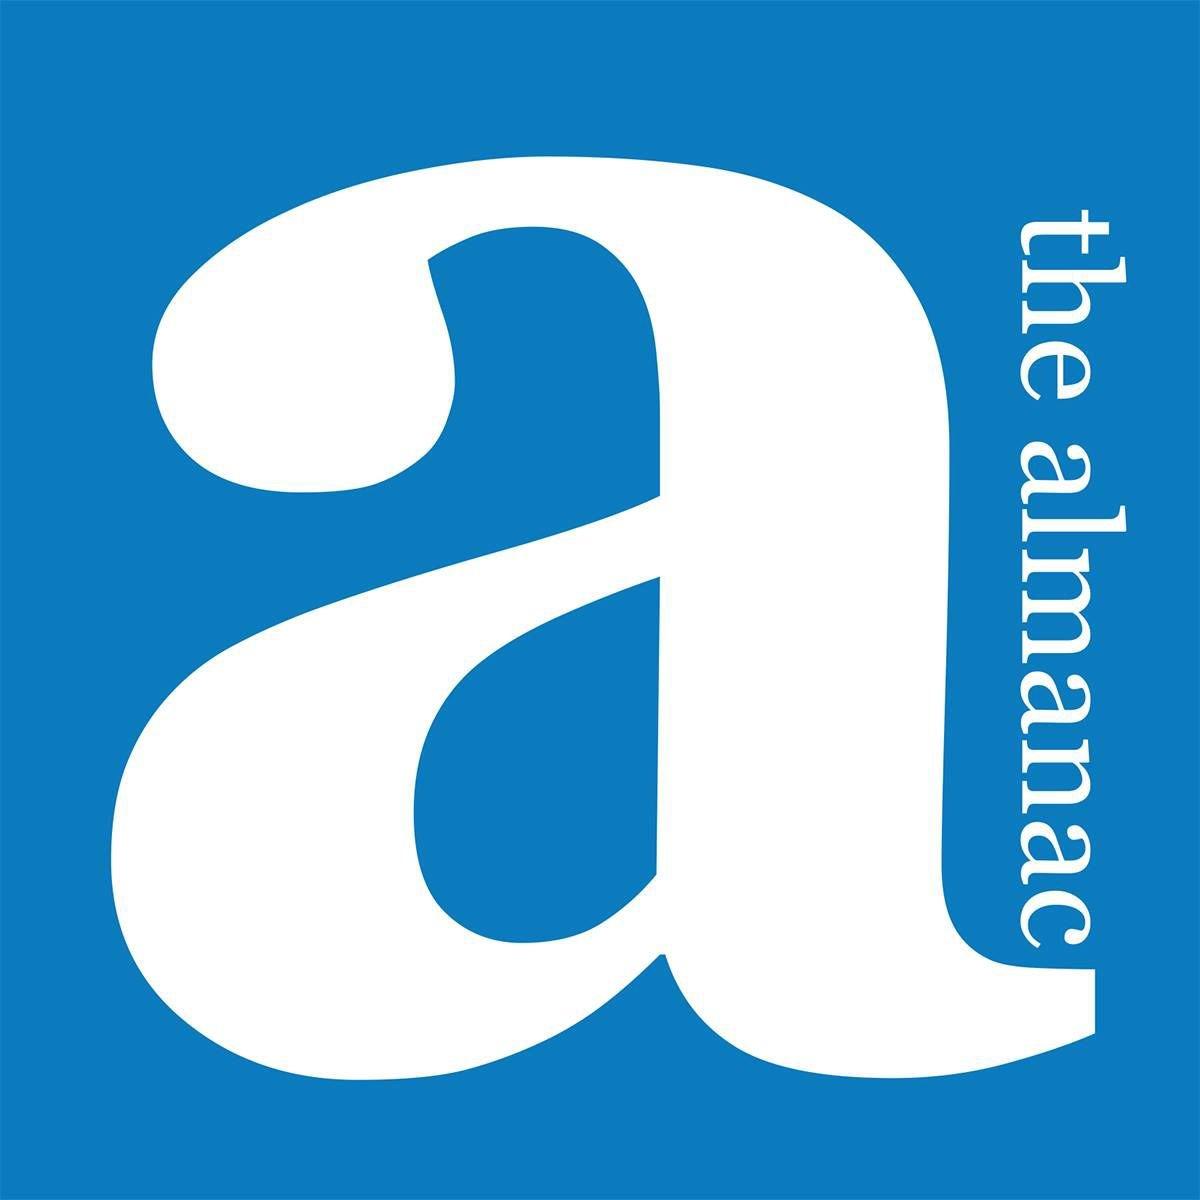 thealmanac net | South Hills Community News